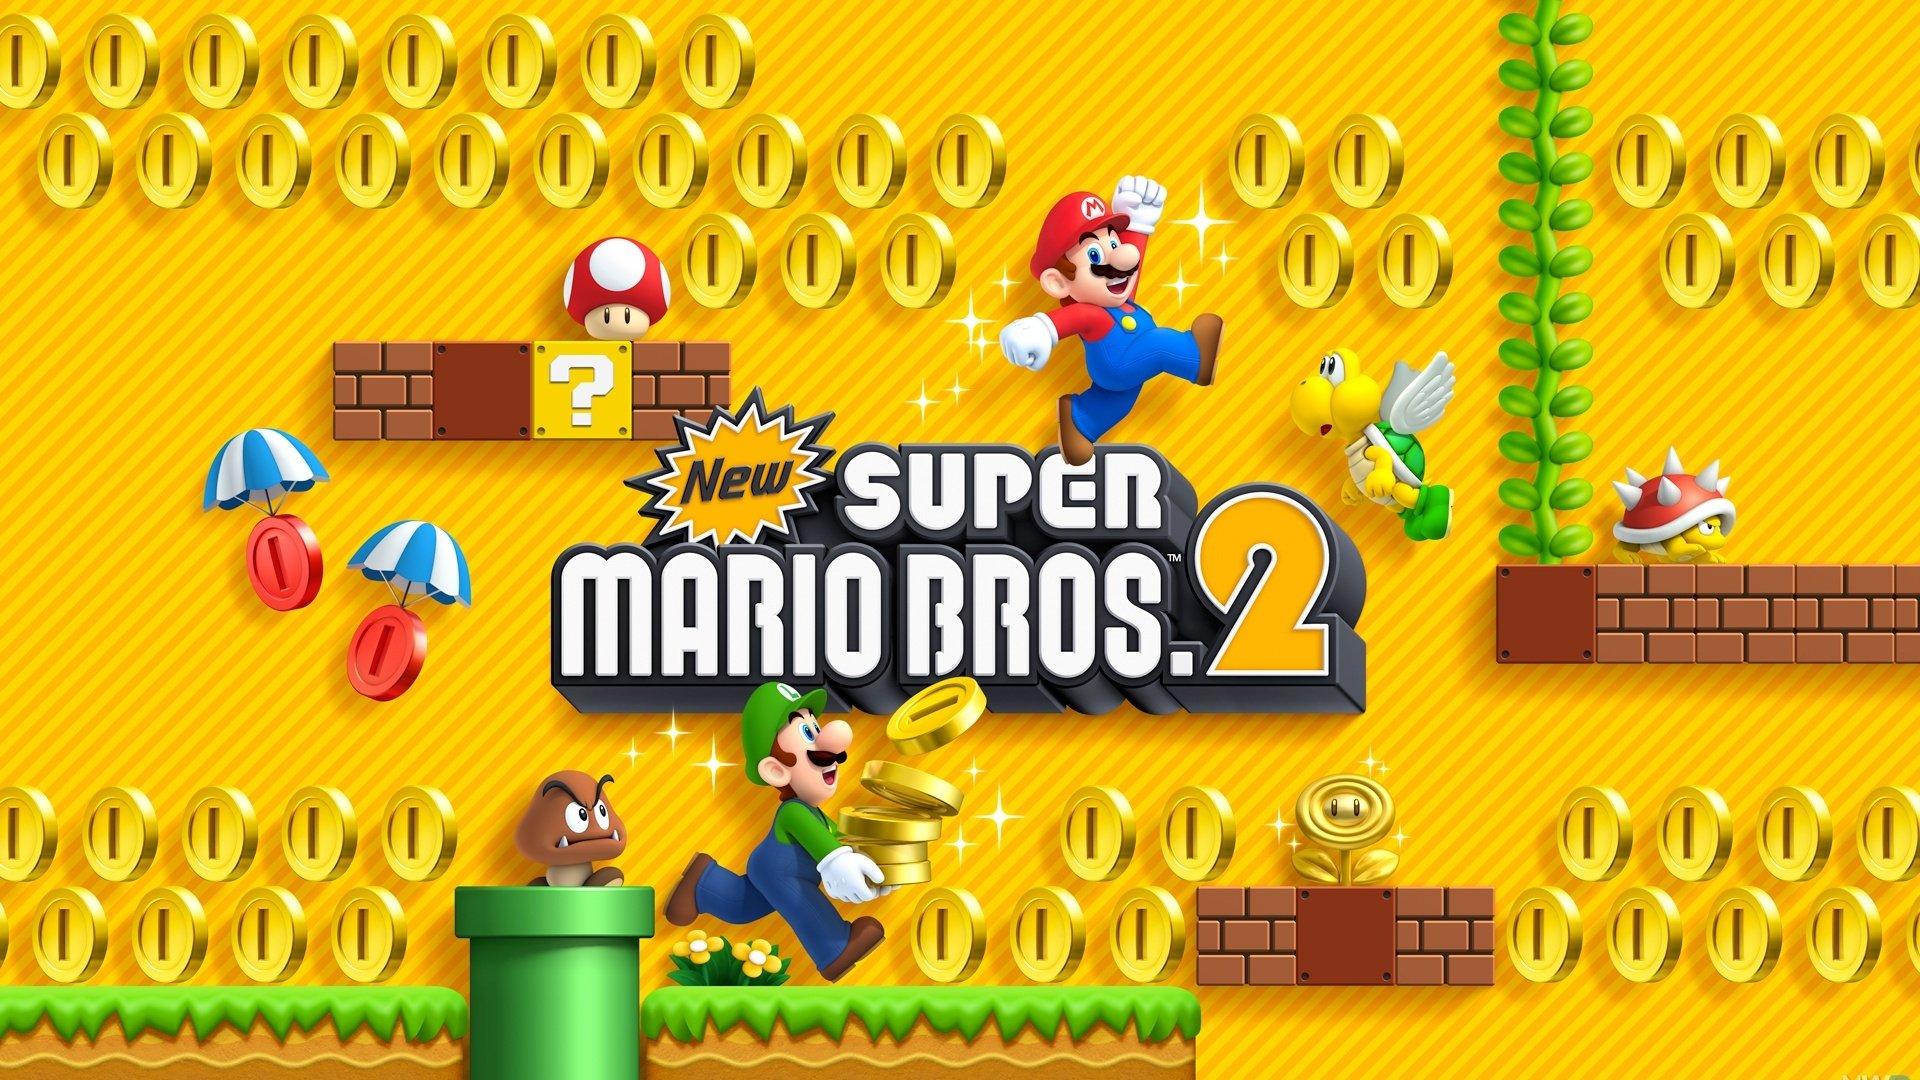 New Super Mario Bros 2 Hd Wallpaper Background Image